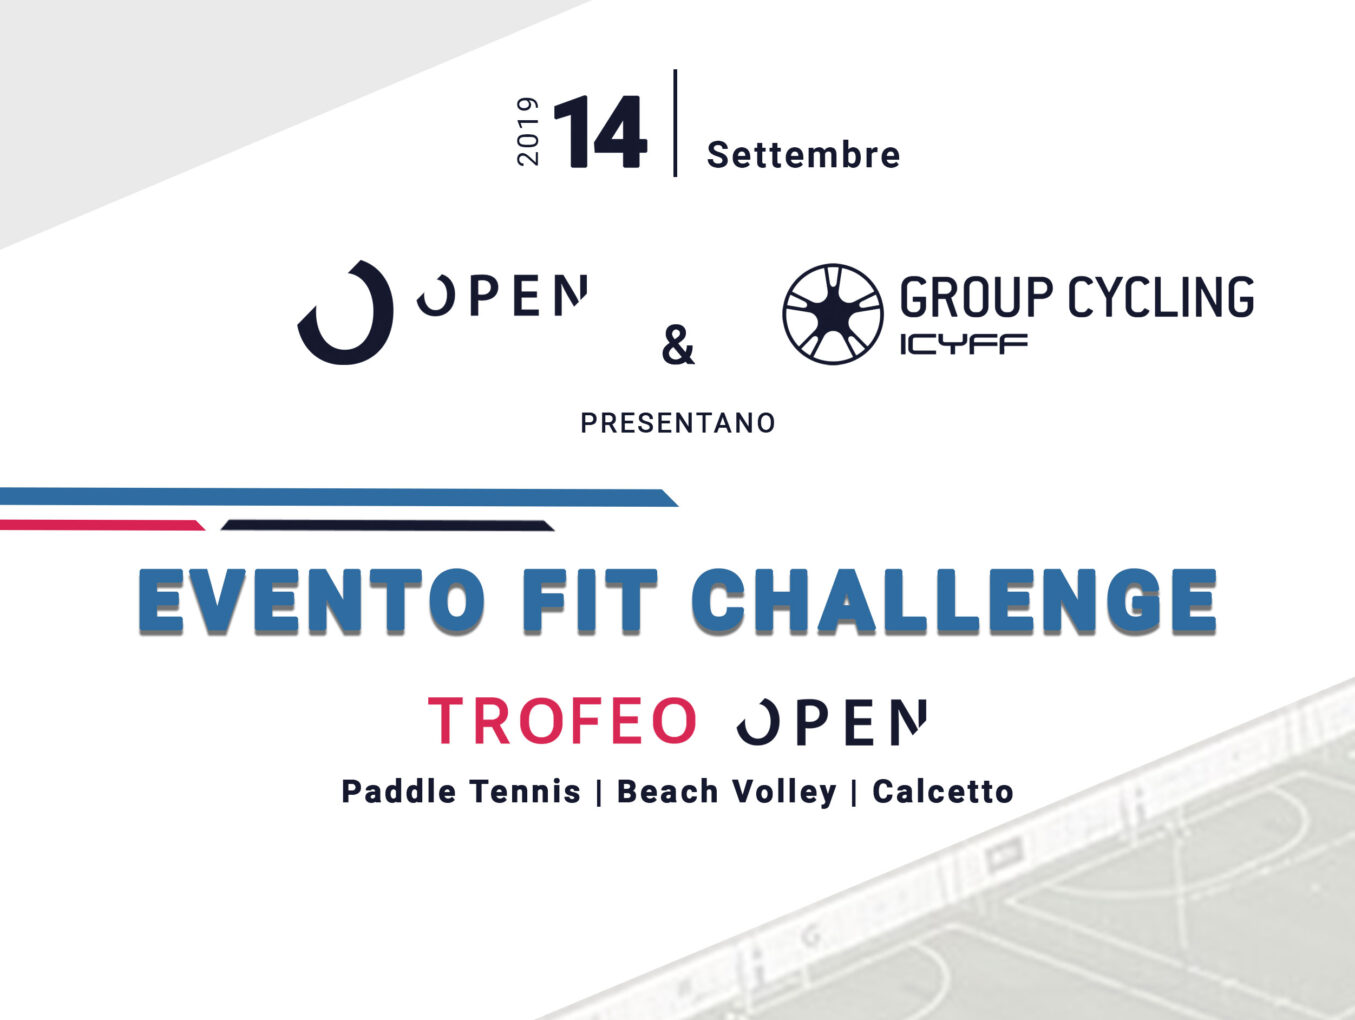 EVENTO FIT CHALLENGE - TROFEO OPEN